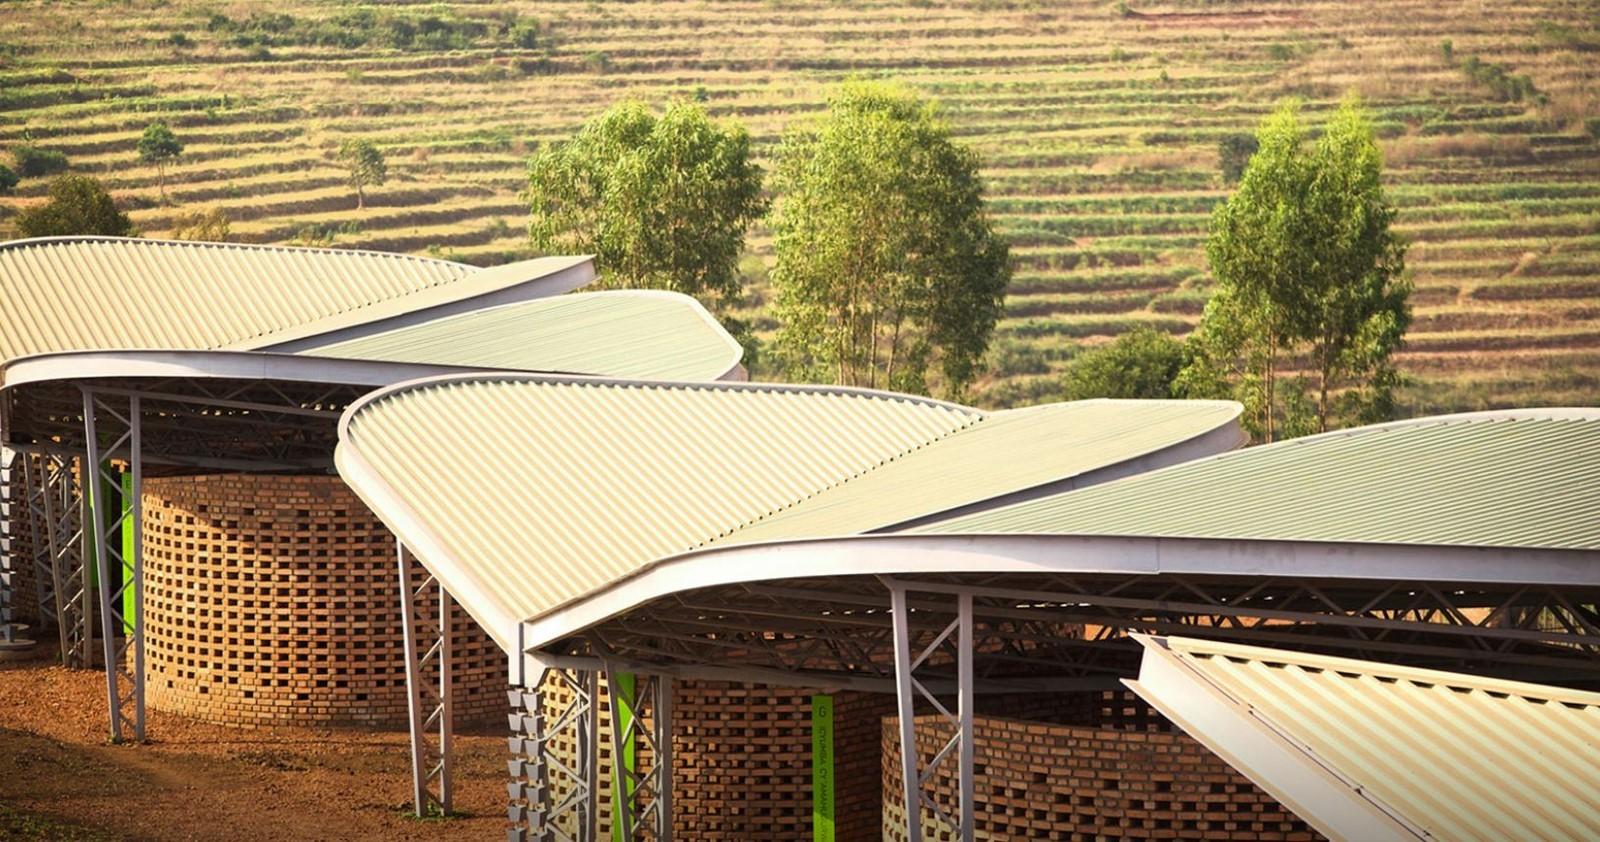 Women's Opportunity Center - Kayonza, Rwanda - Sheet1